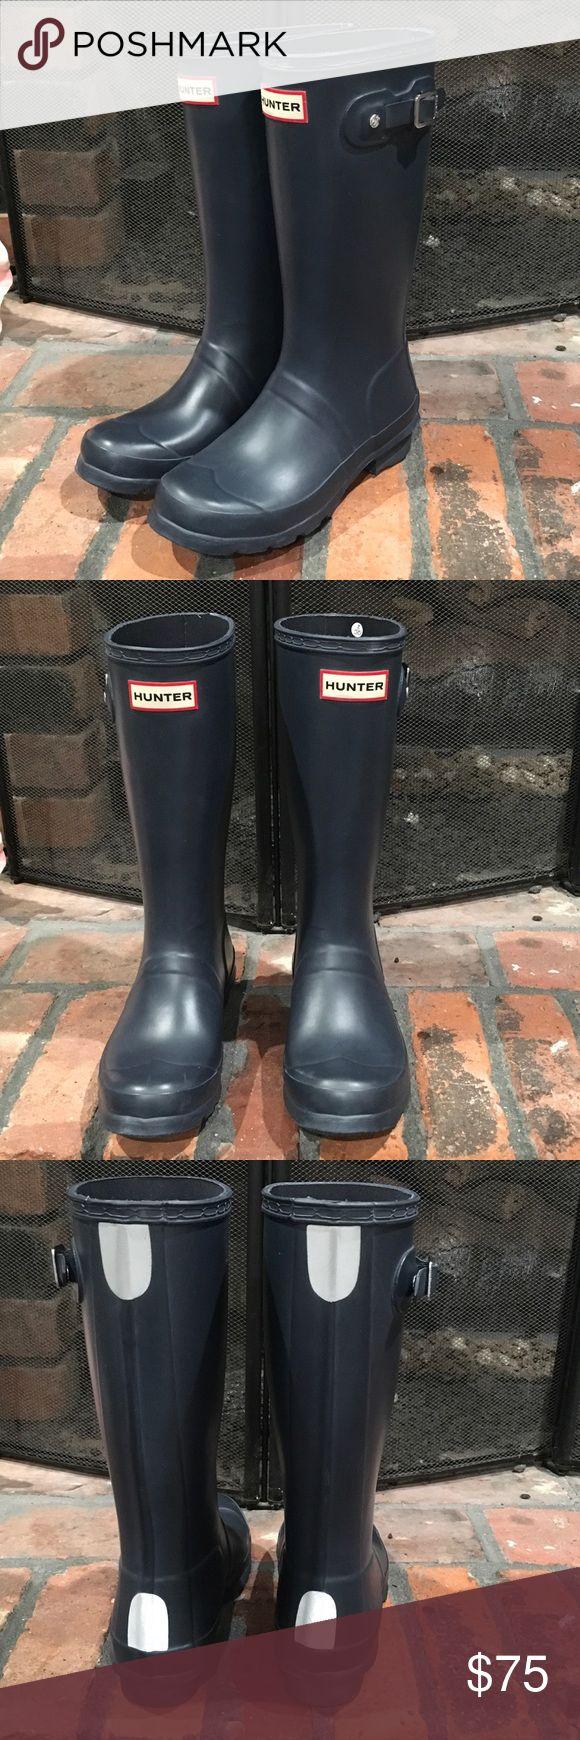 Hunter Original Kids Wellie Boots Hunter Original Kids Wellie Boots size 2 boys/ 3 girls.  Navy blue.  Excellent condition. Hunter Boots Shoes Rain & Snow Boots